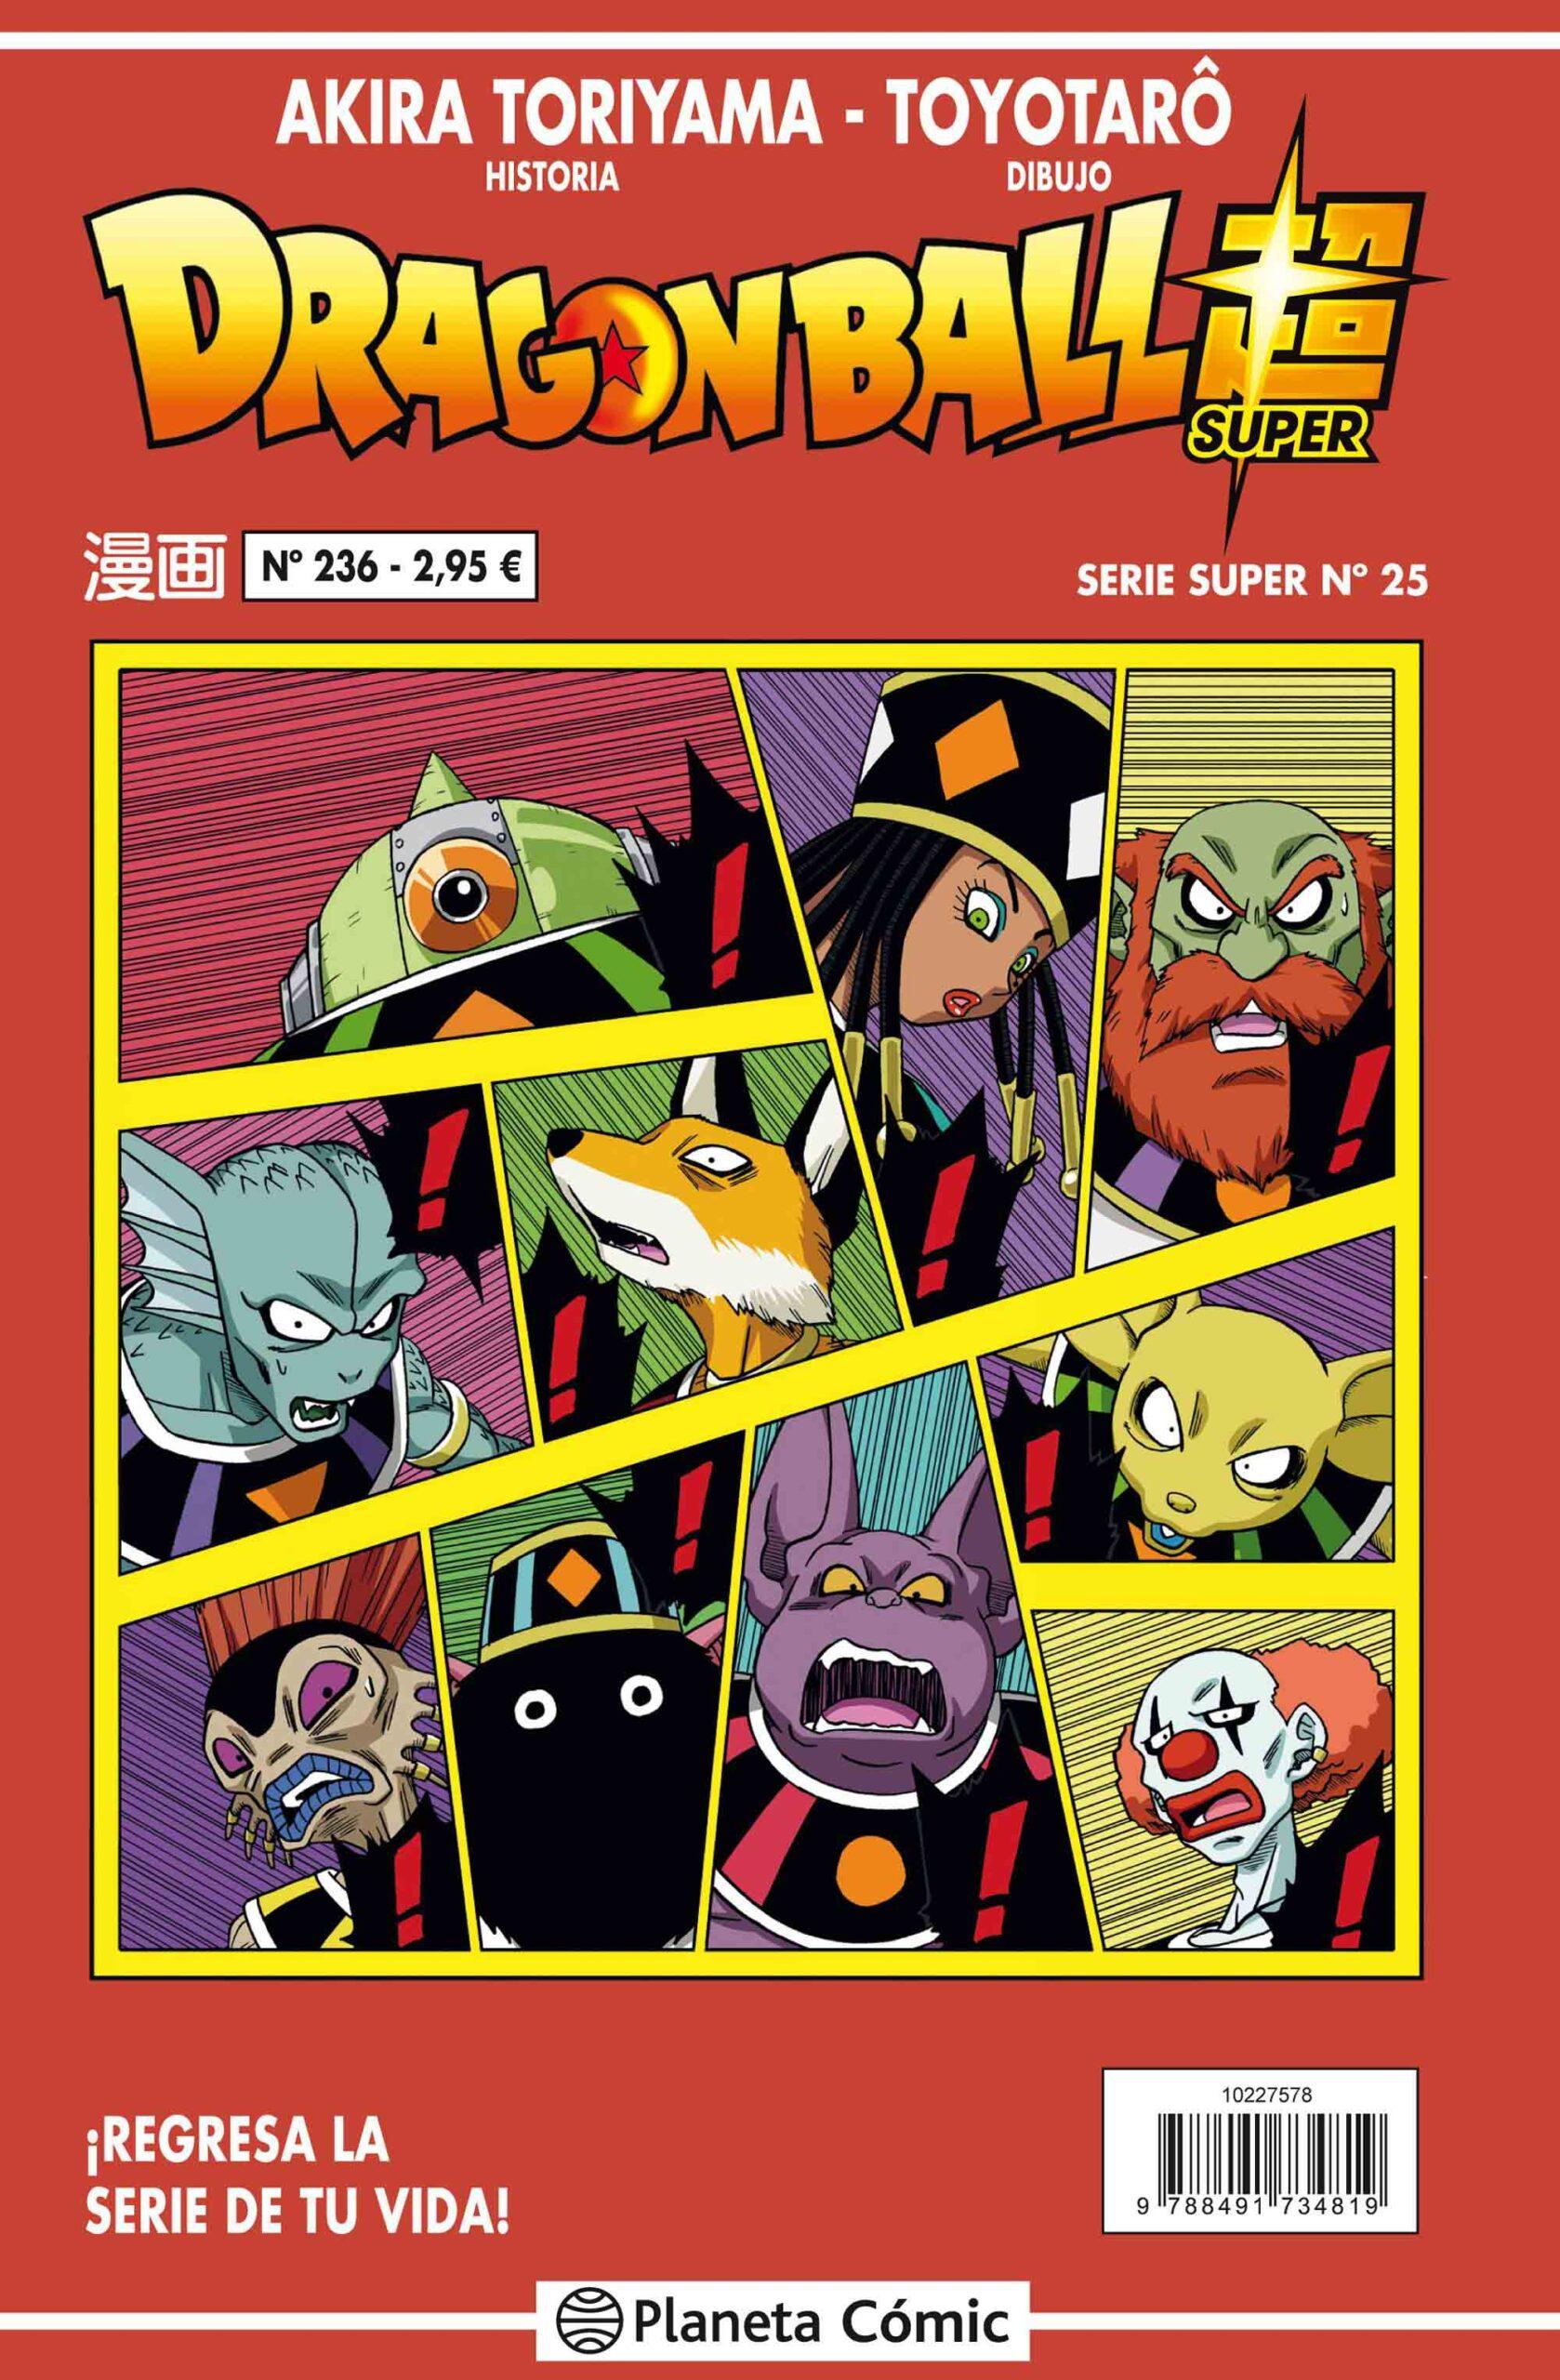 'Dragon Ball Super' 25 / 236 Serie Roja. Reseña del manga